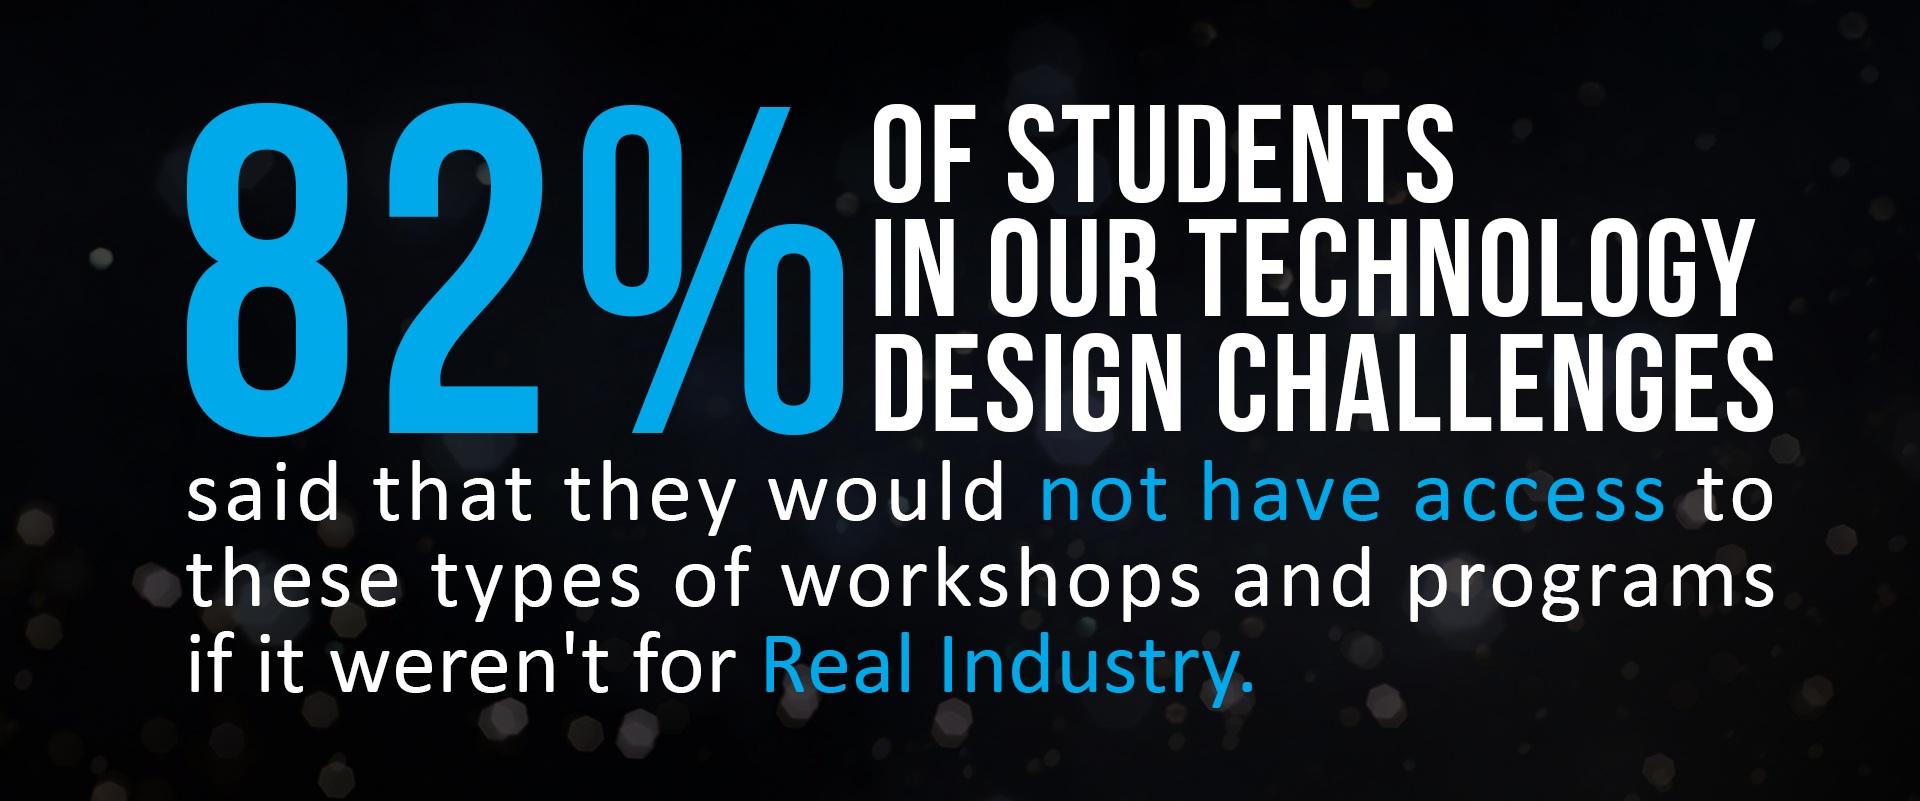 design challenge impact